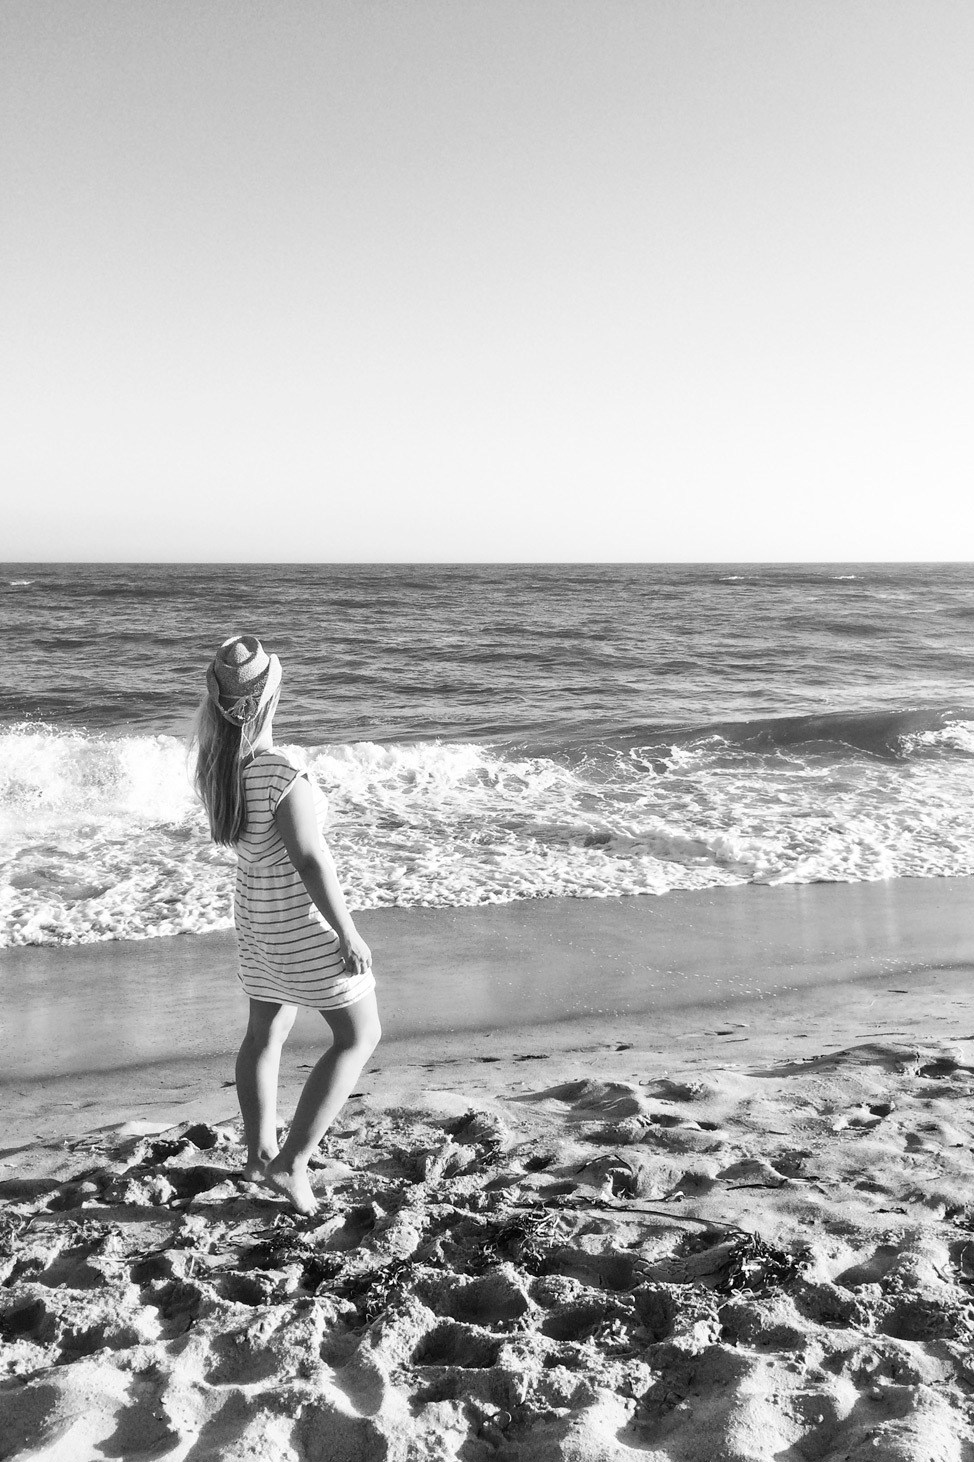 Marthas Vineyard Beach in Black and White